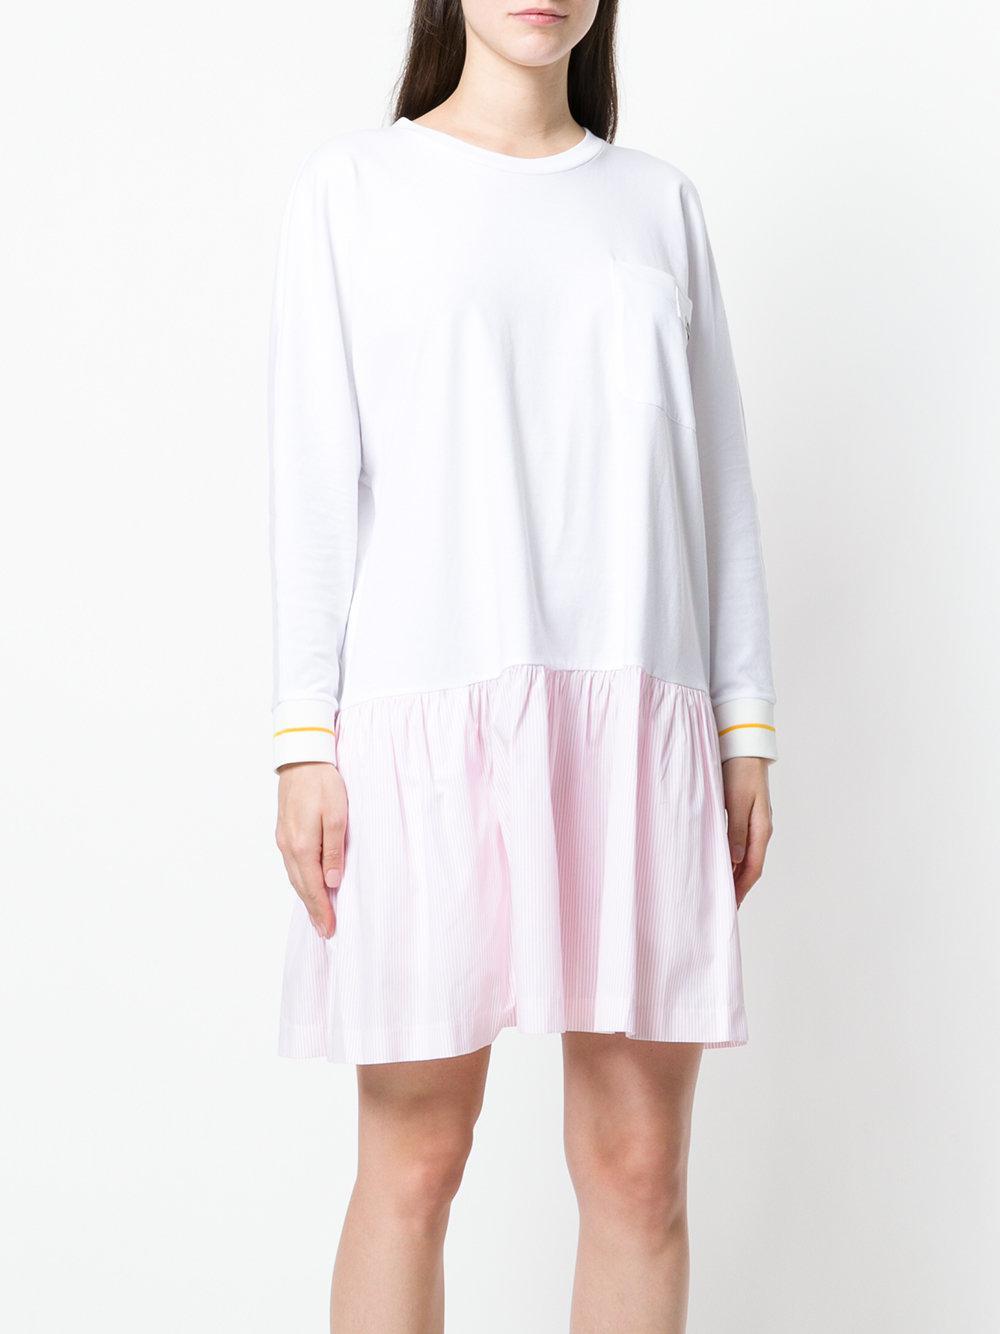 pinstripe detail dress - White Miu Miu X5FWt7GR